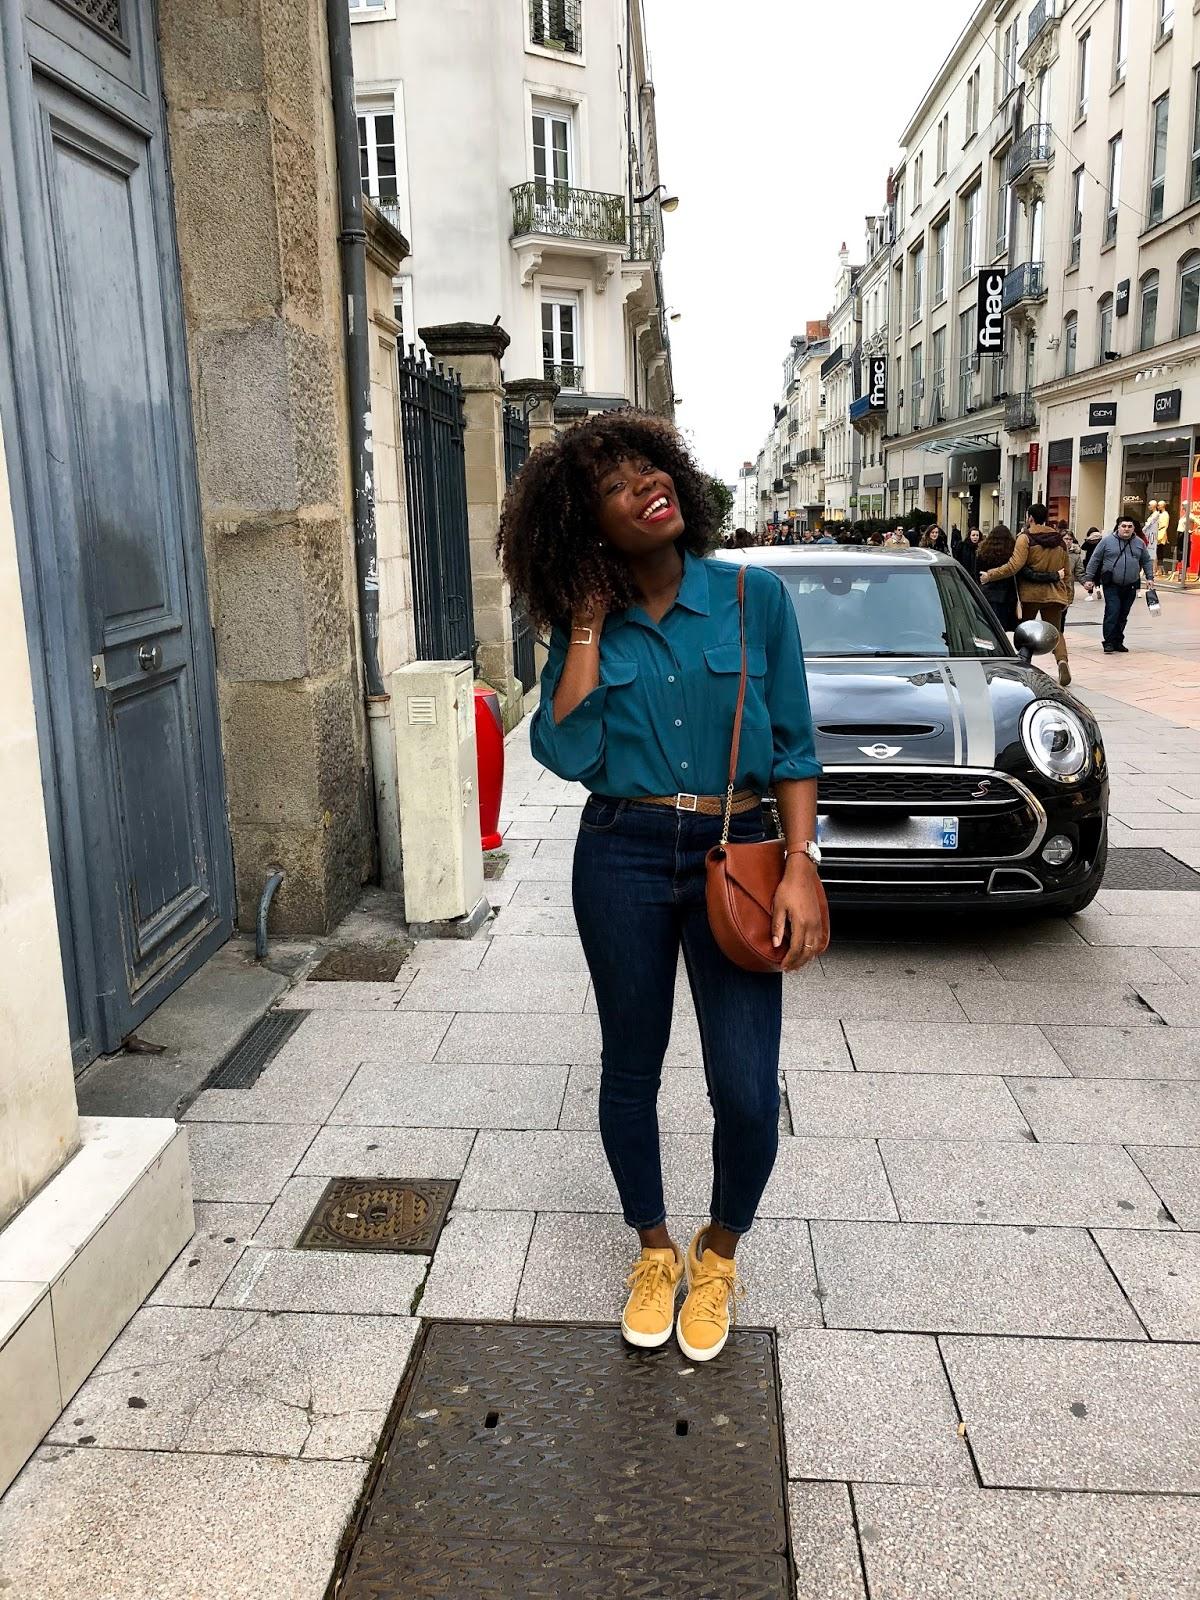 mia faker jean brut baskets jaune moutarde chemise bleu canard